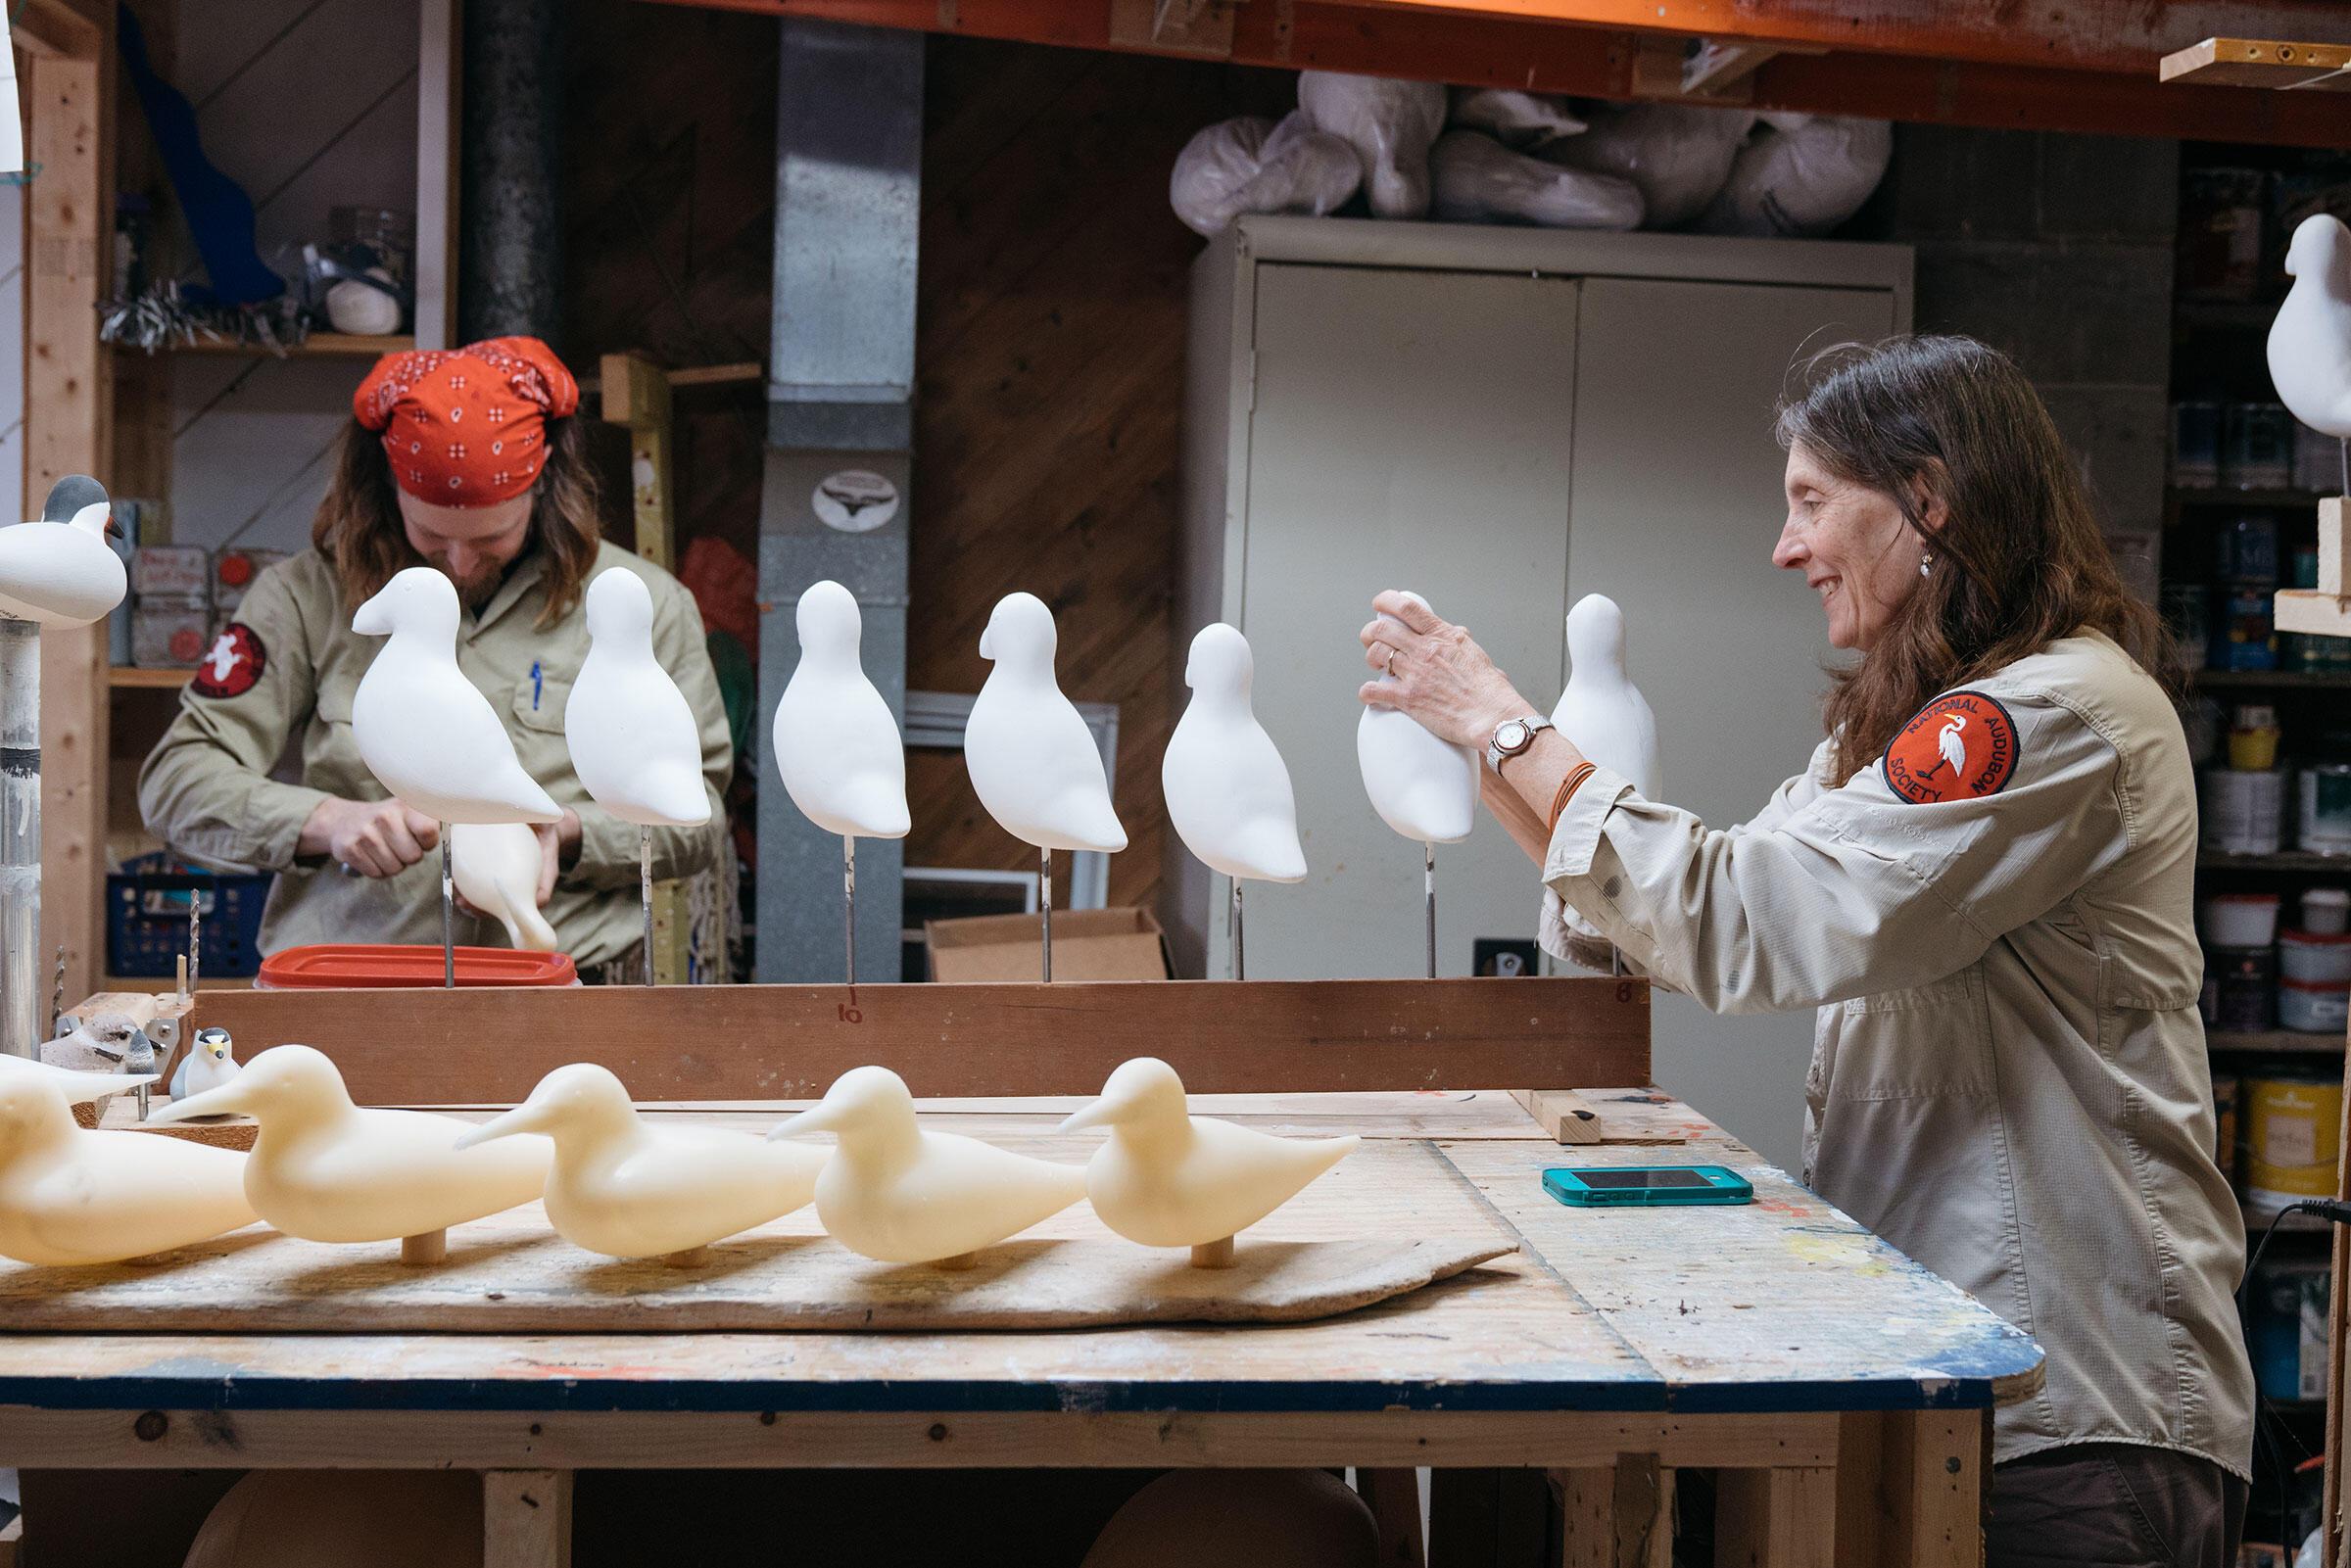 Snyder and Sue Schubel work on a batch of handmade decoys. Tristan Spinski